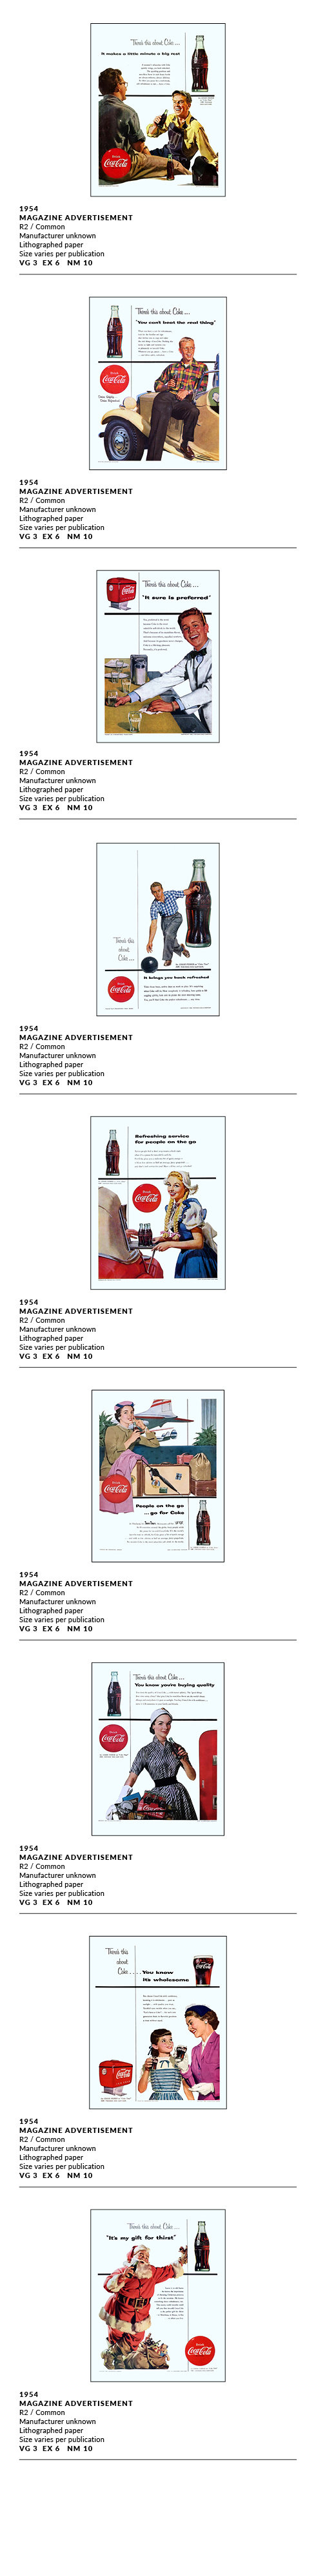 1950-54 Ads9.jpg